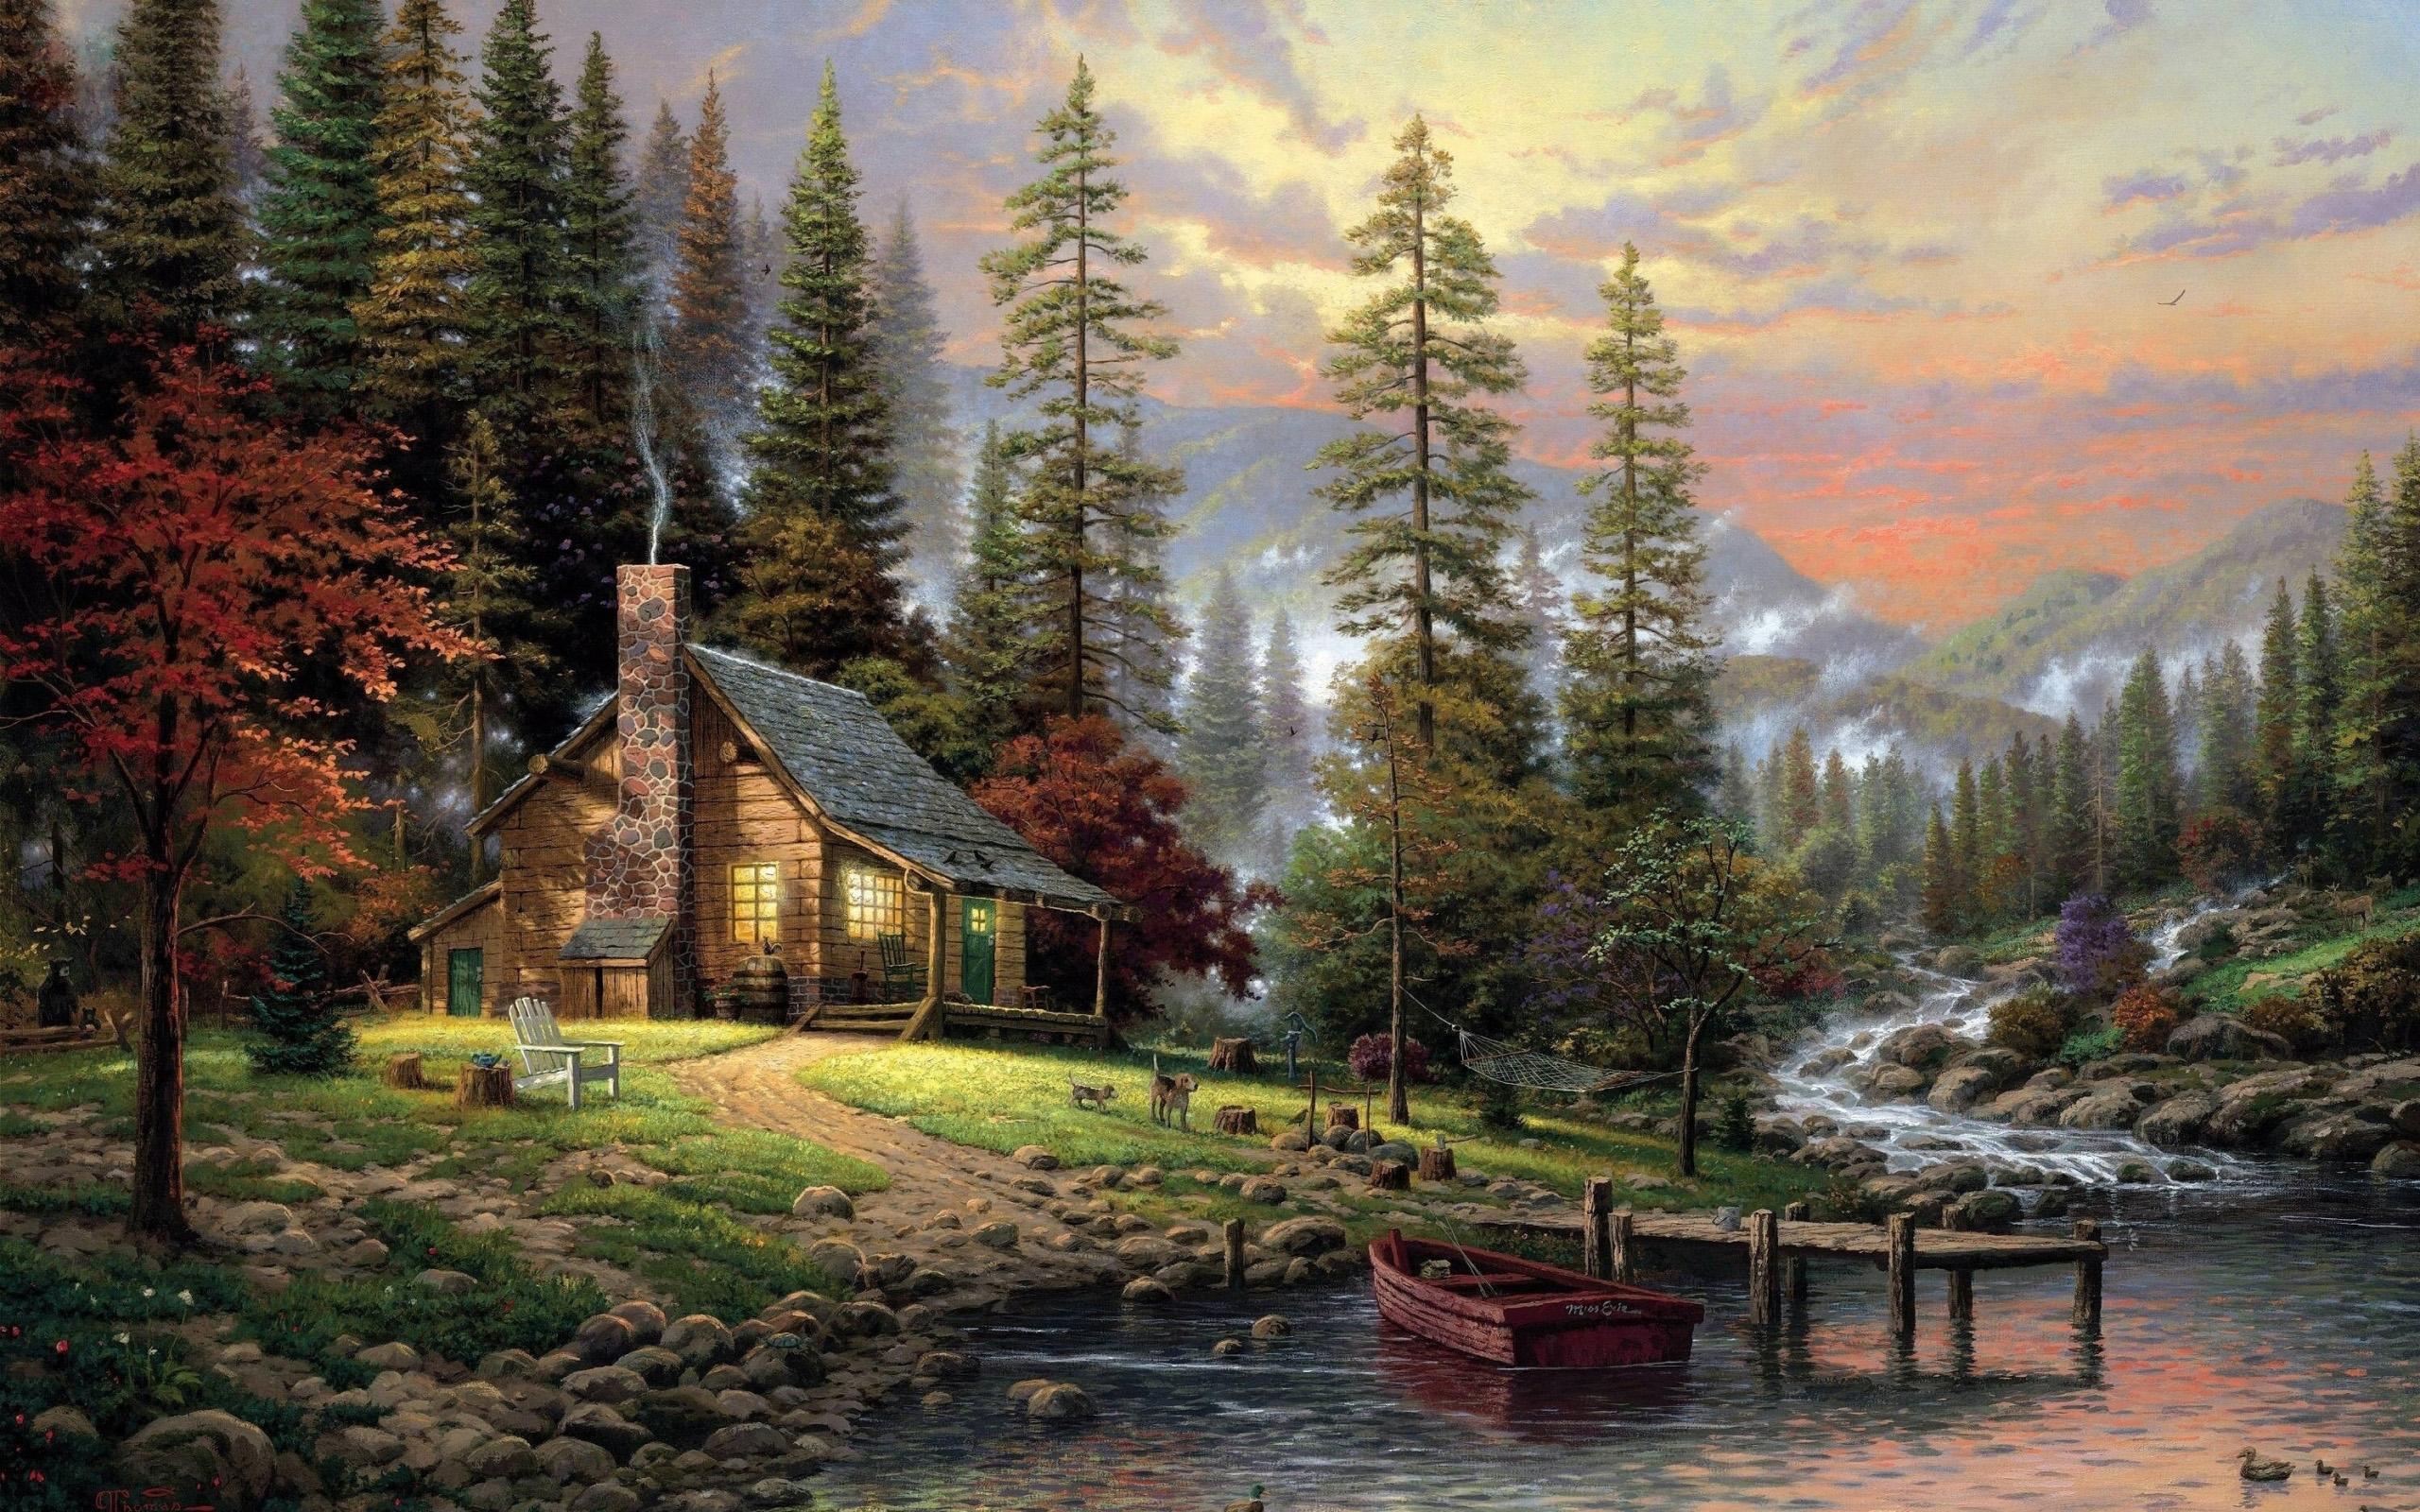 Nature Paintings Wallpaper 6978850 2560x1600